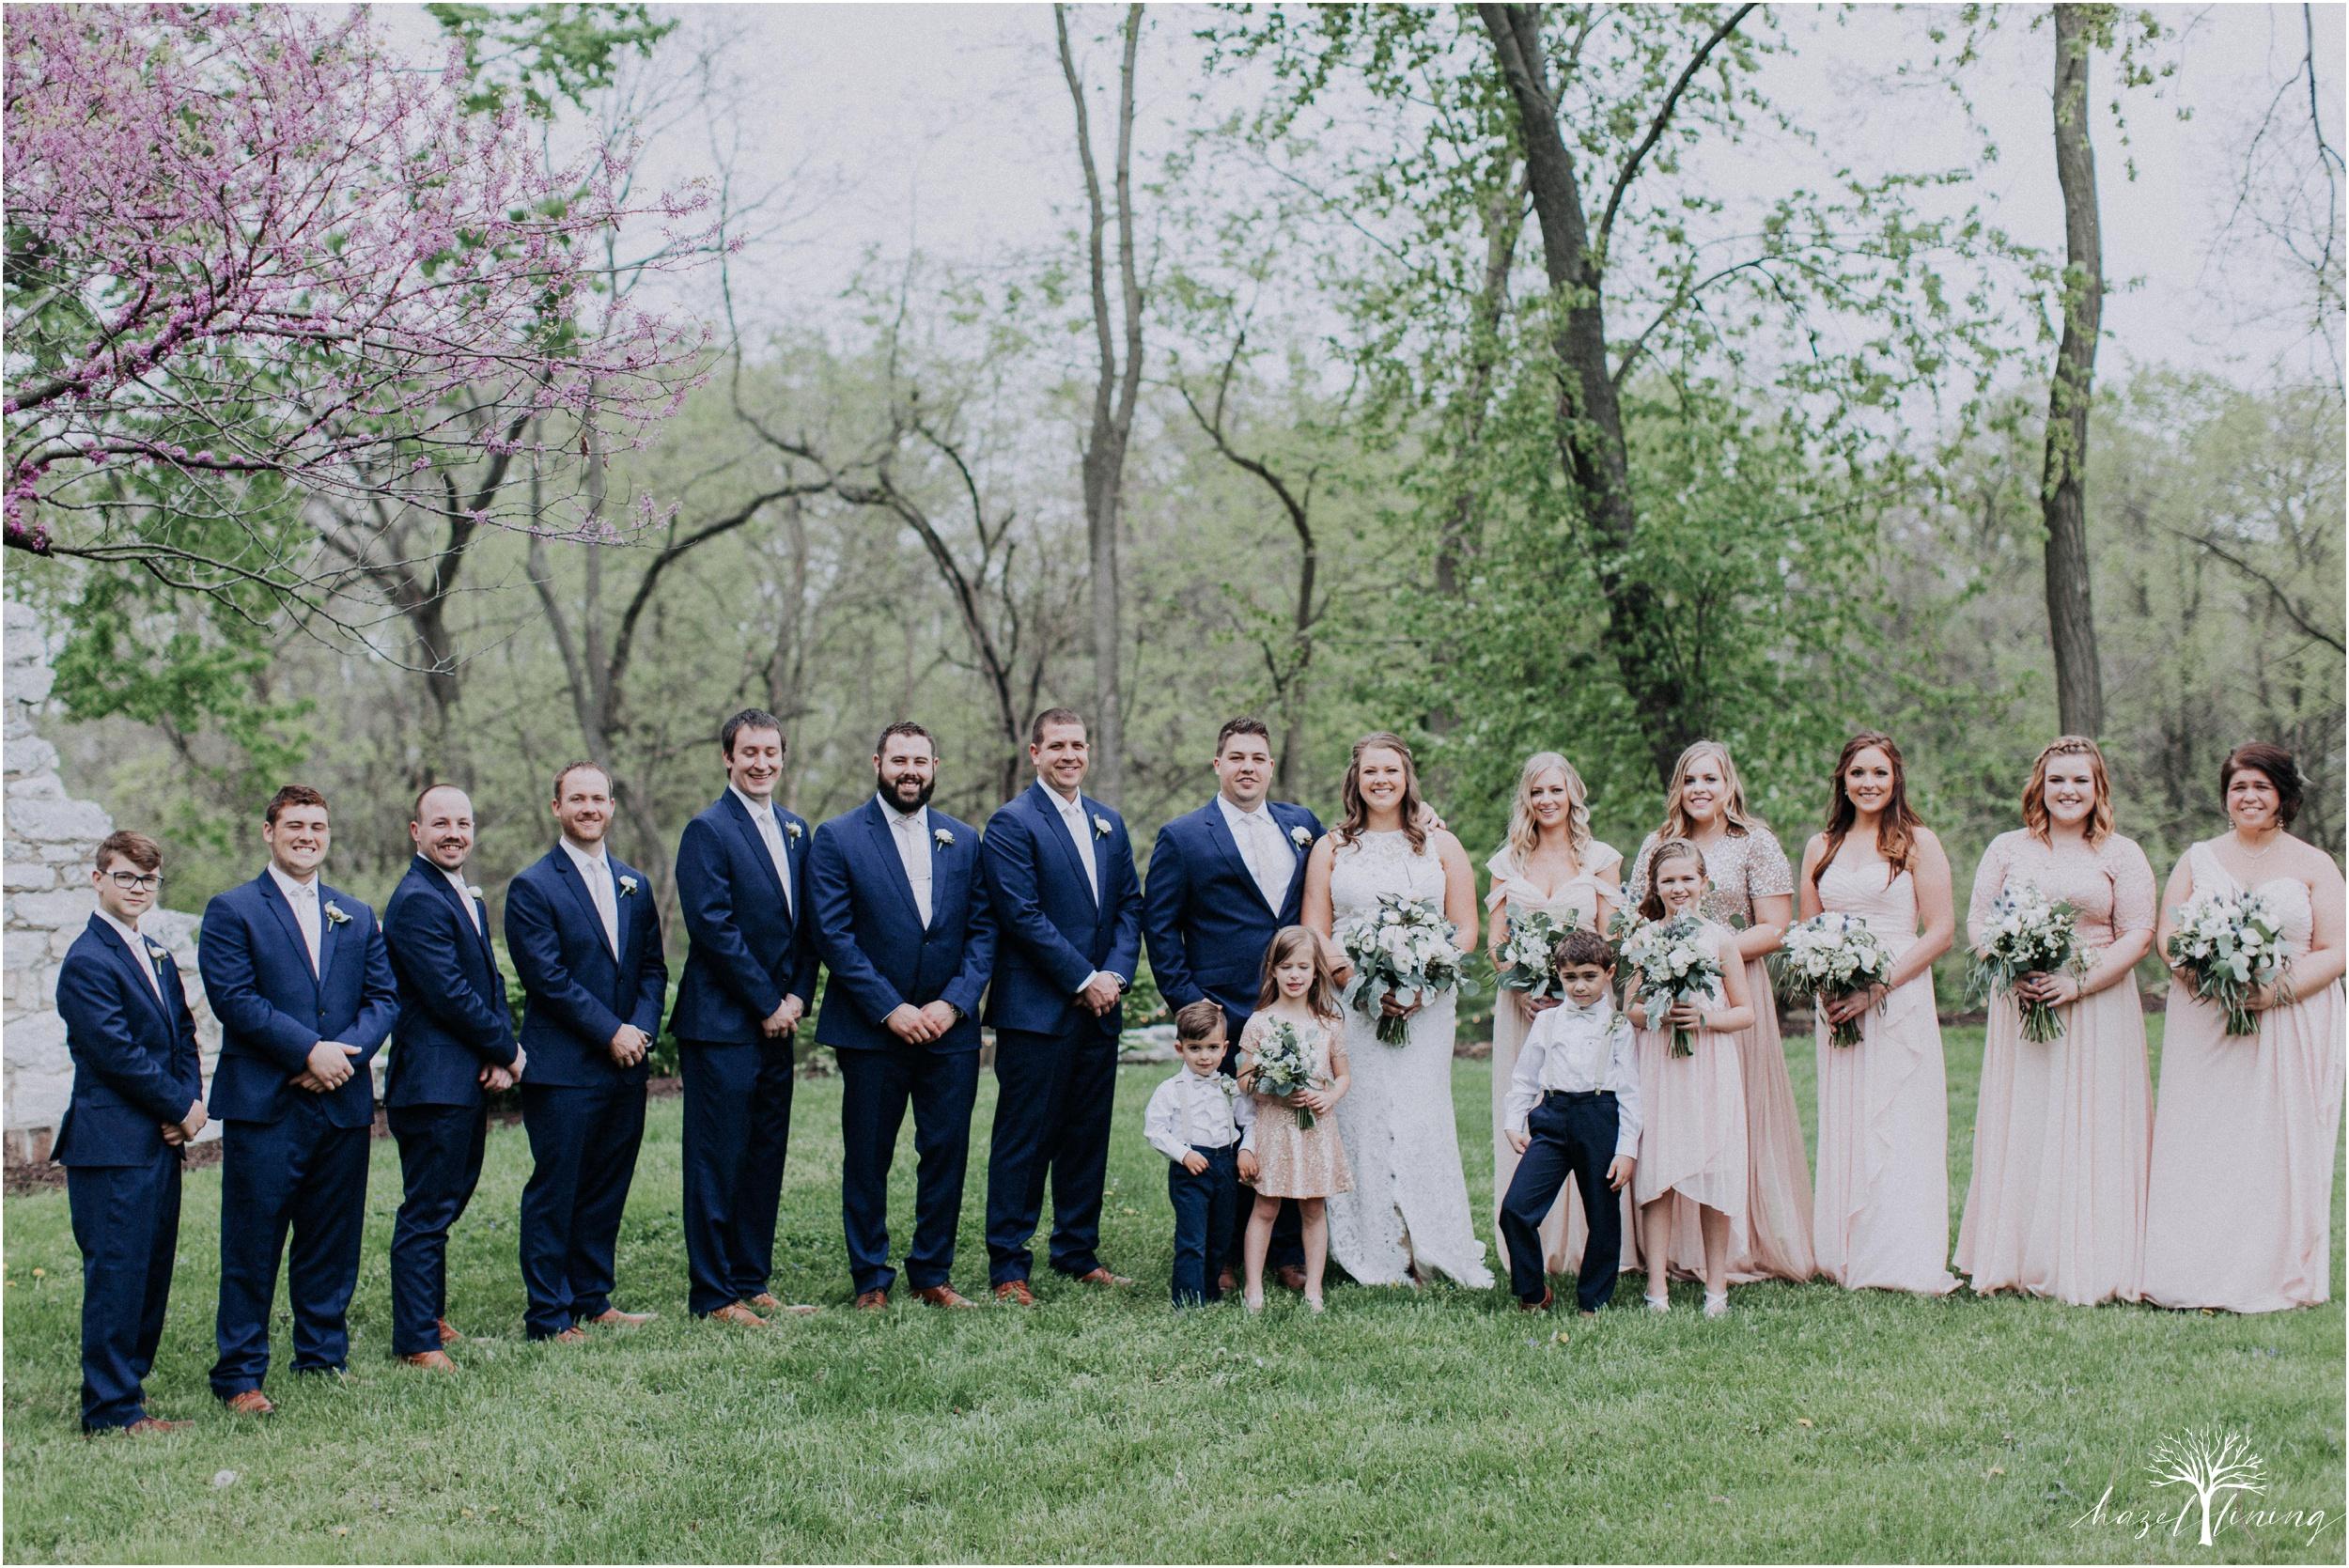 hazel-lining-travel-wedding-elopement-photography-abby-skyler-hunt-the-willis-house-york-pennsylvania-outdoor-estate-wedding_0055.jpg